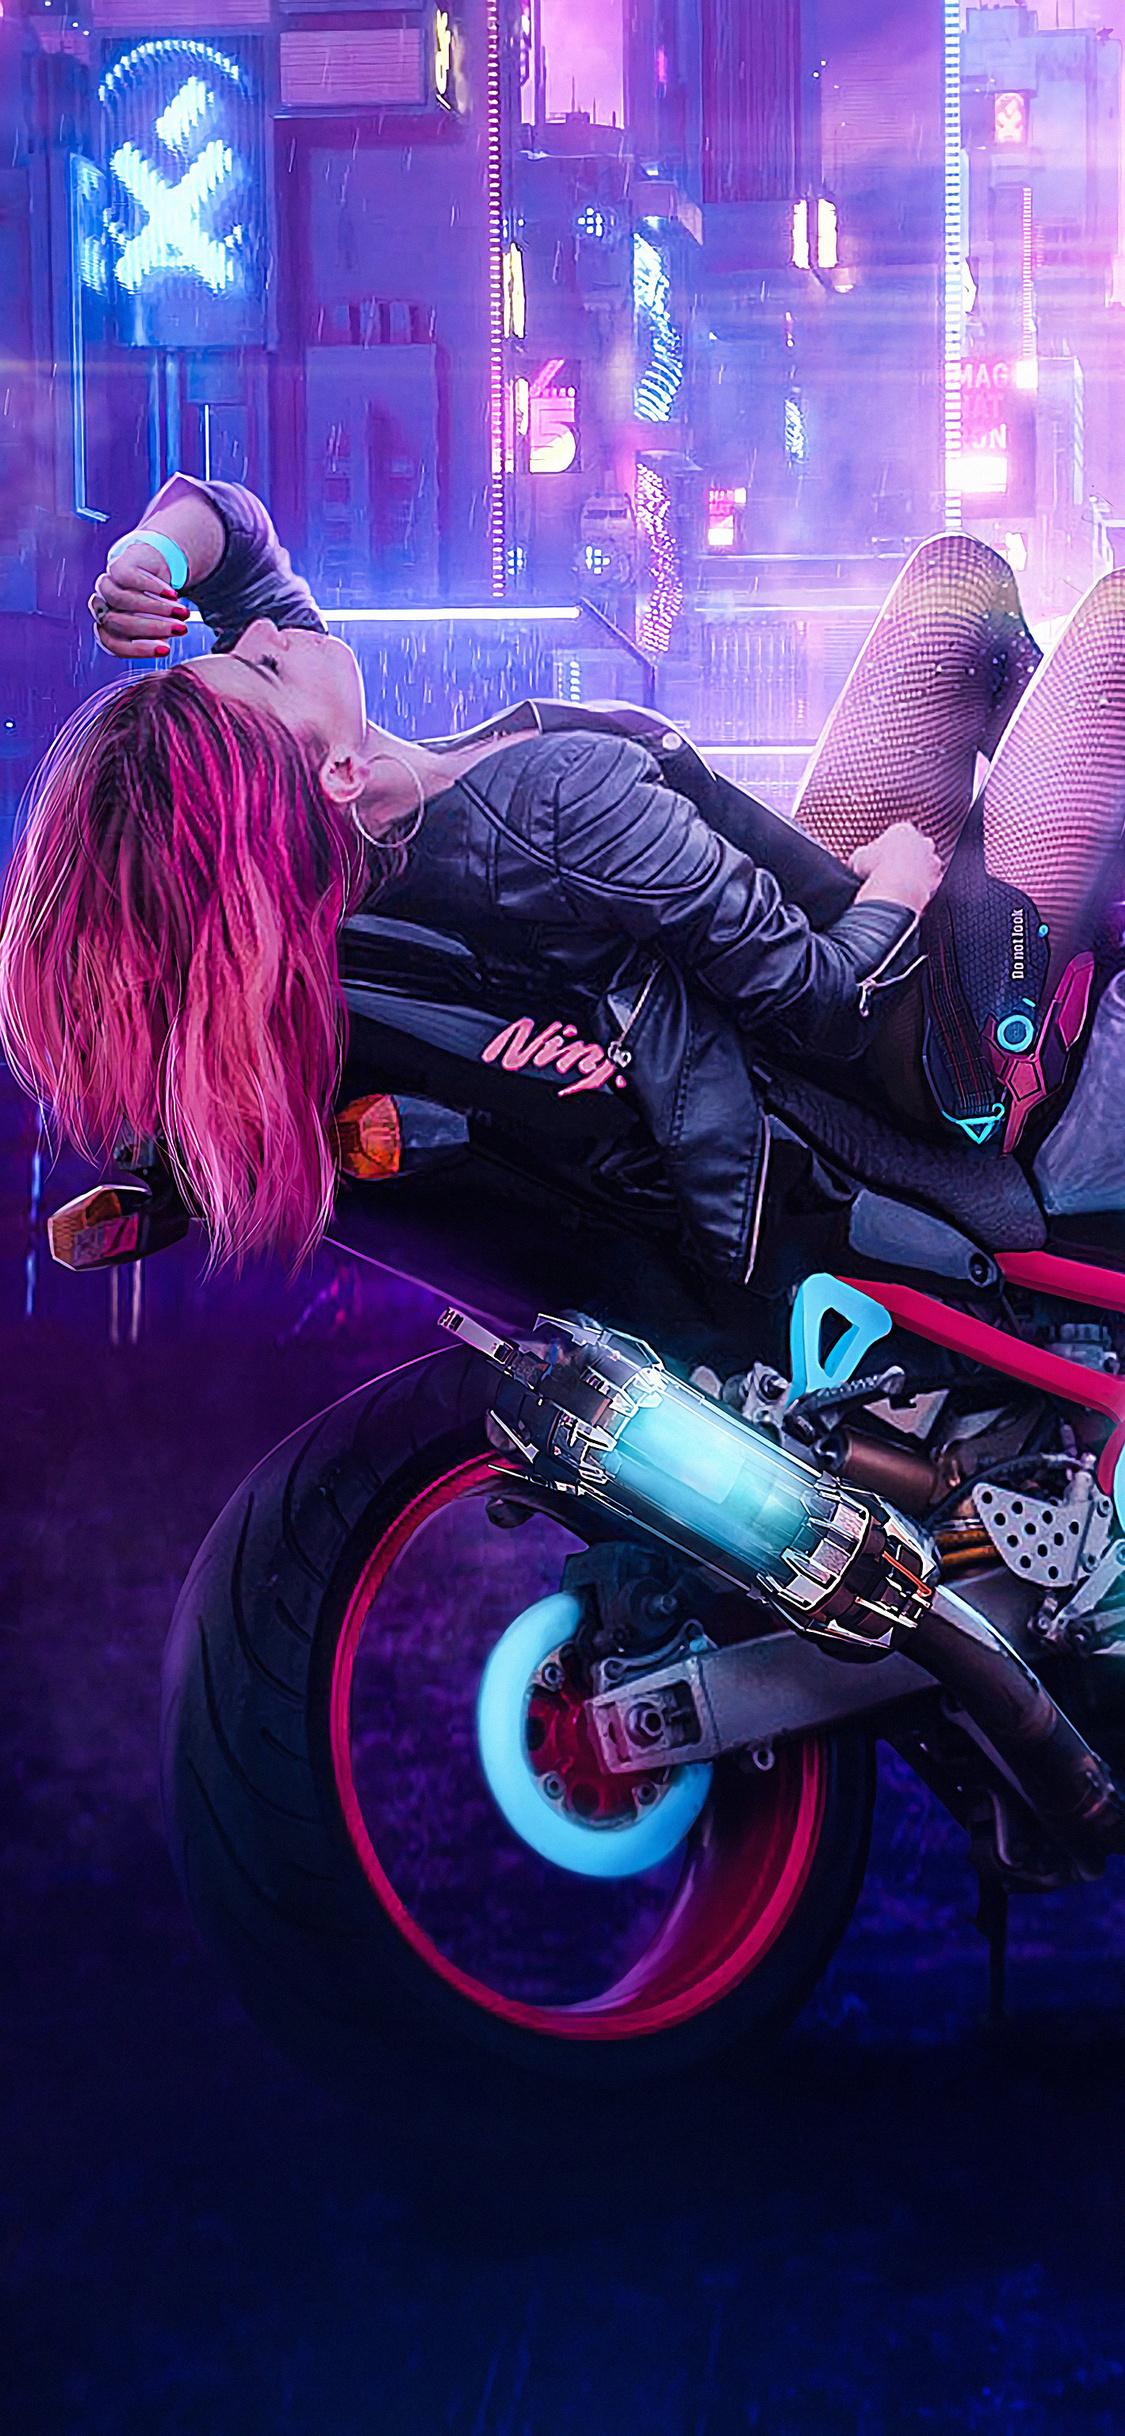 21x21 Cyberpunk Girl On Bike Iphone XS,Iphone 21,Iphone X HD ...